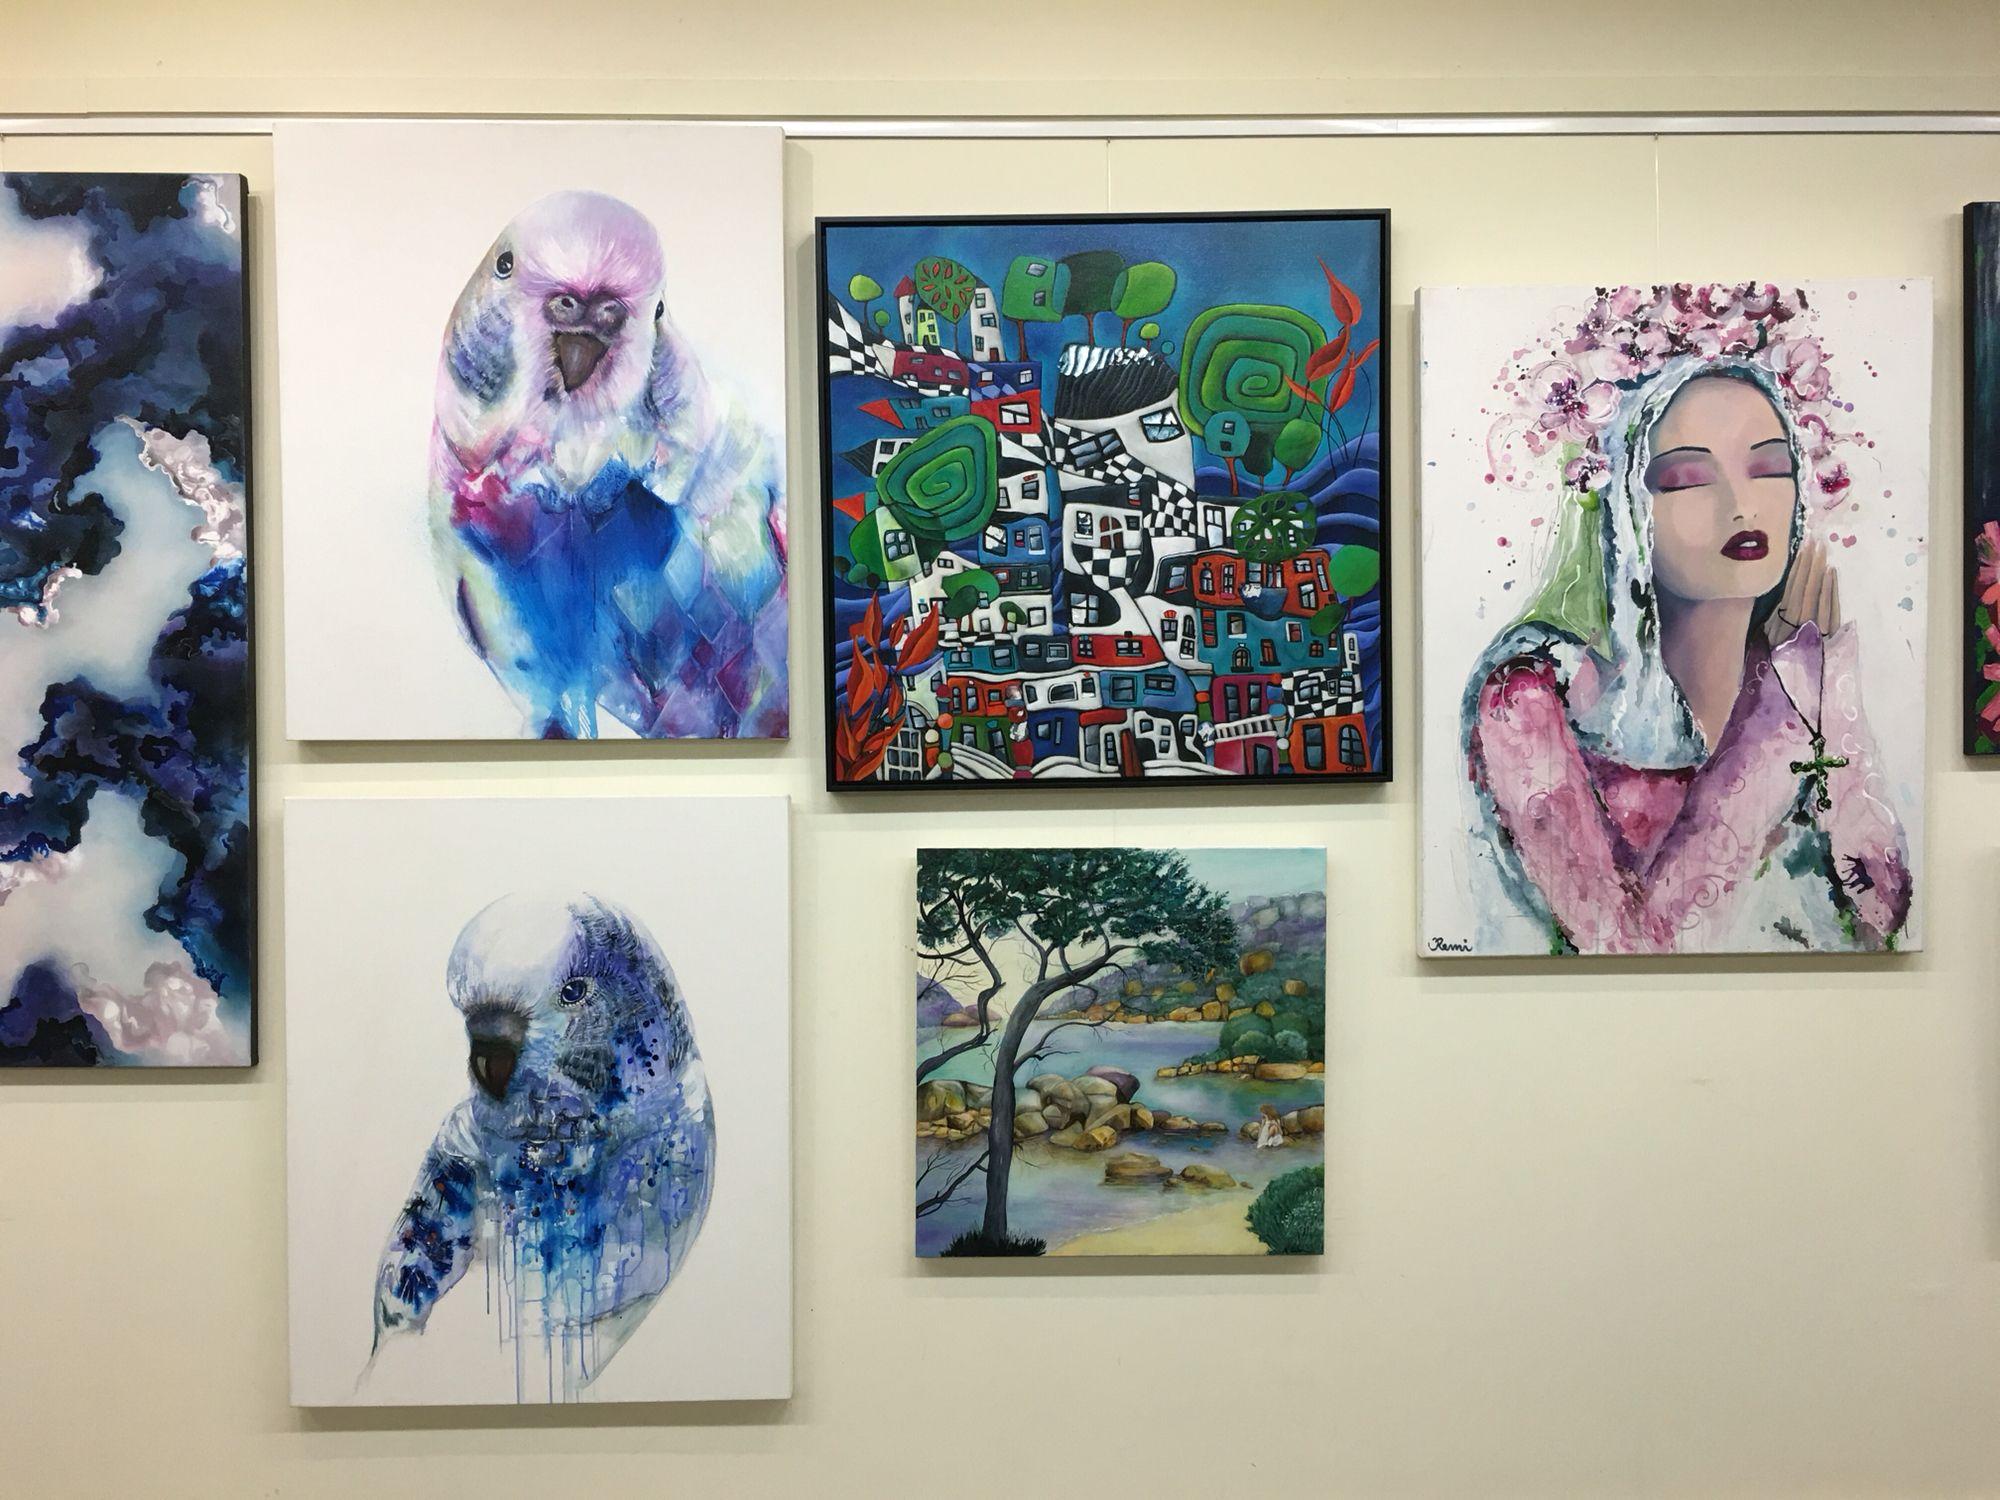 George Michael Pop Art Paint By Number Kit